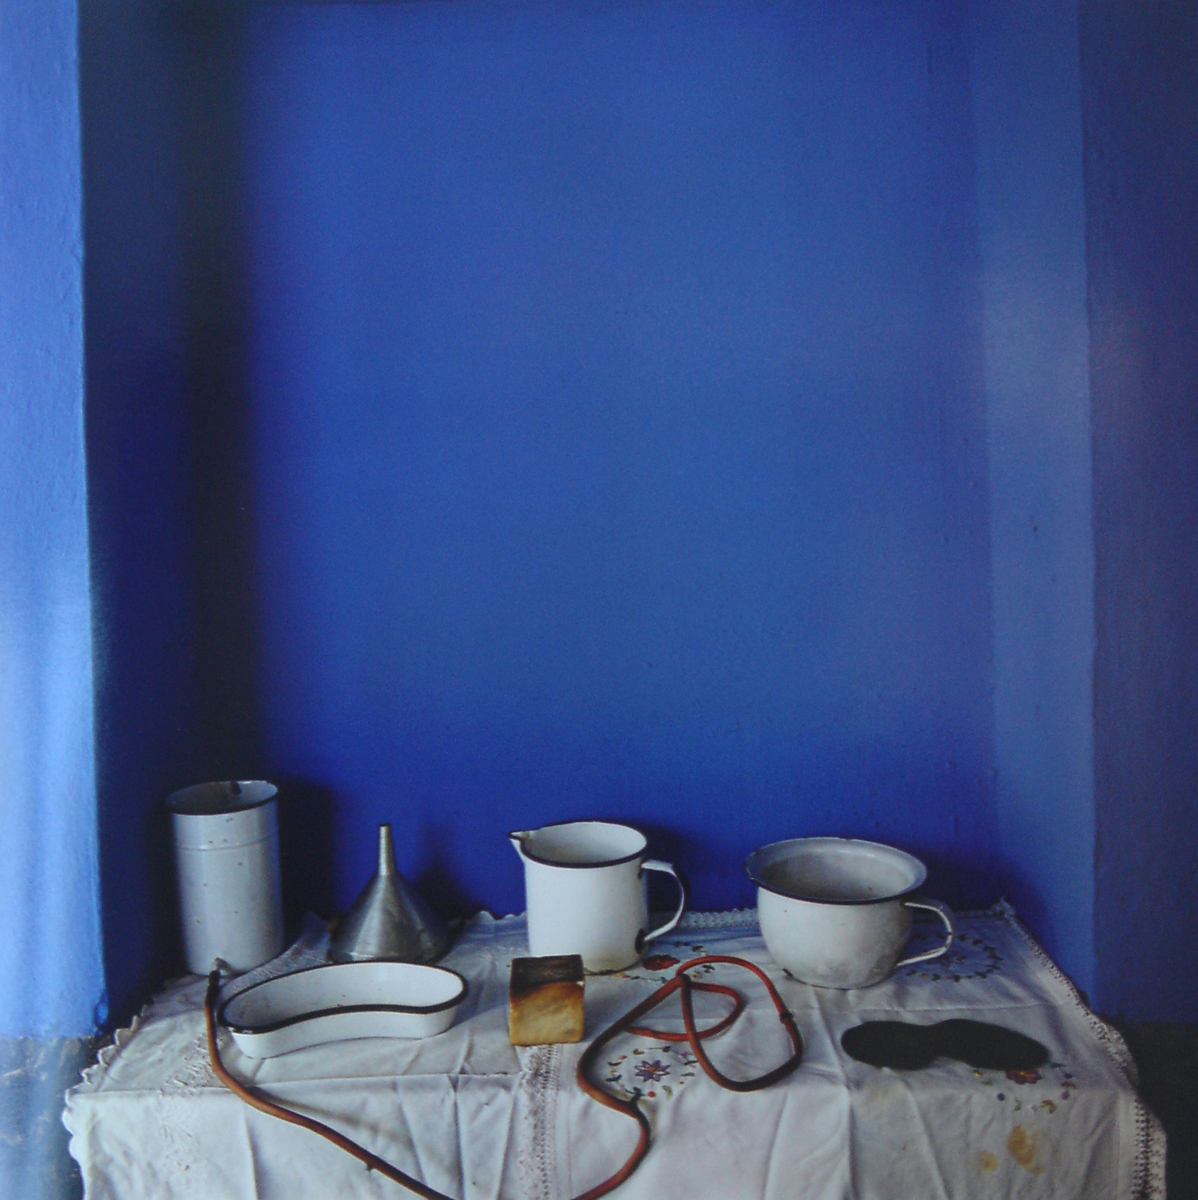 Casa de Frida Kahlo (E) , 2005  Sheet 17 x 14 inches / Image 12 x 12 inches  Dye Transfer Print